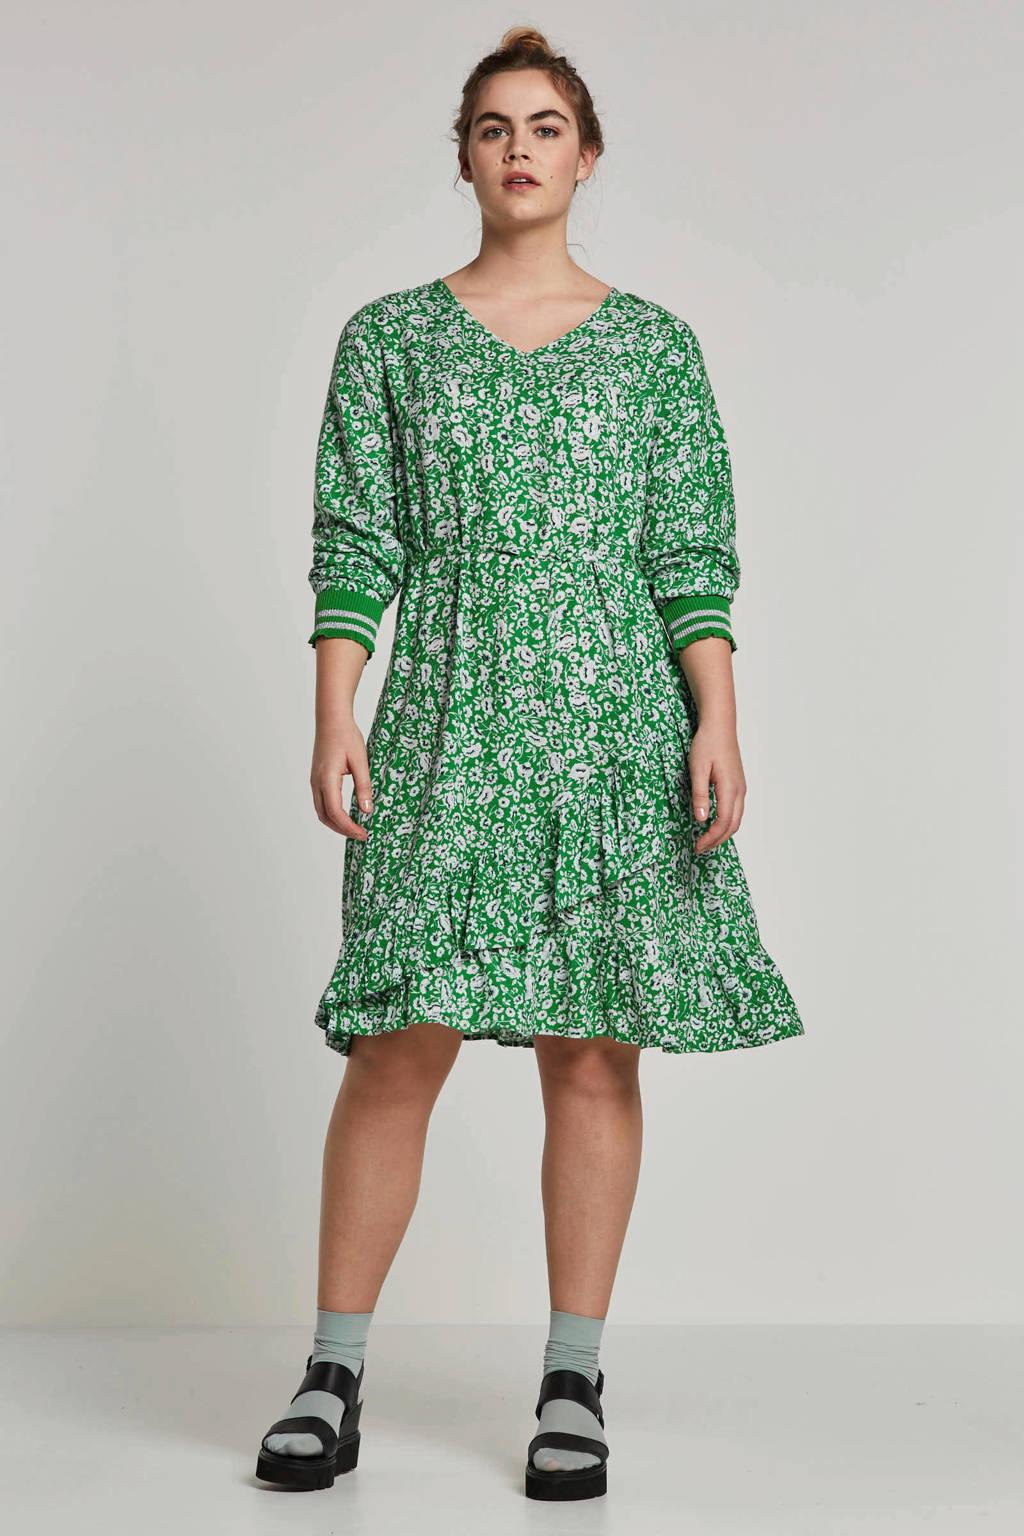 Zhenzi jurk met all-over print, Groen/wit